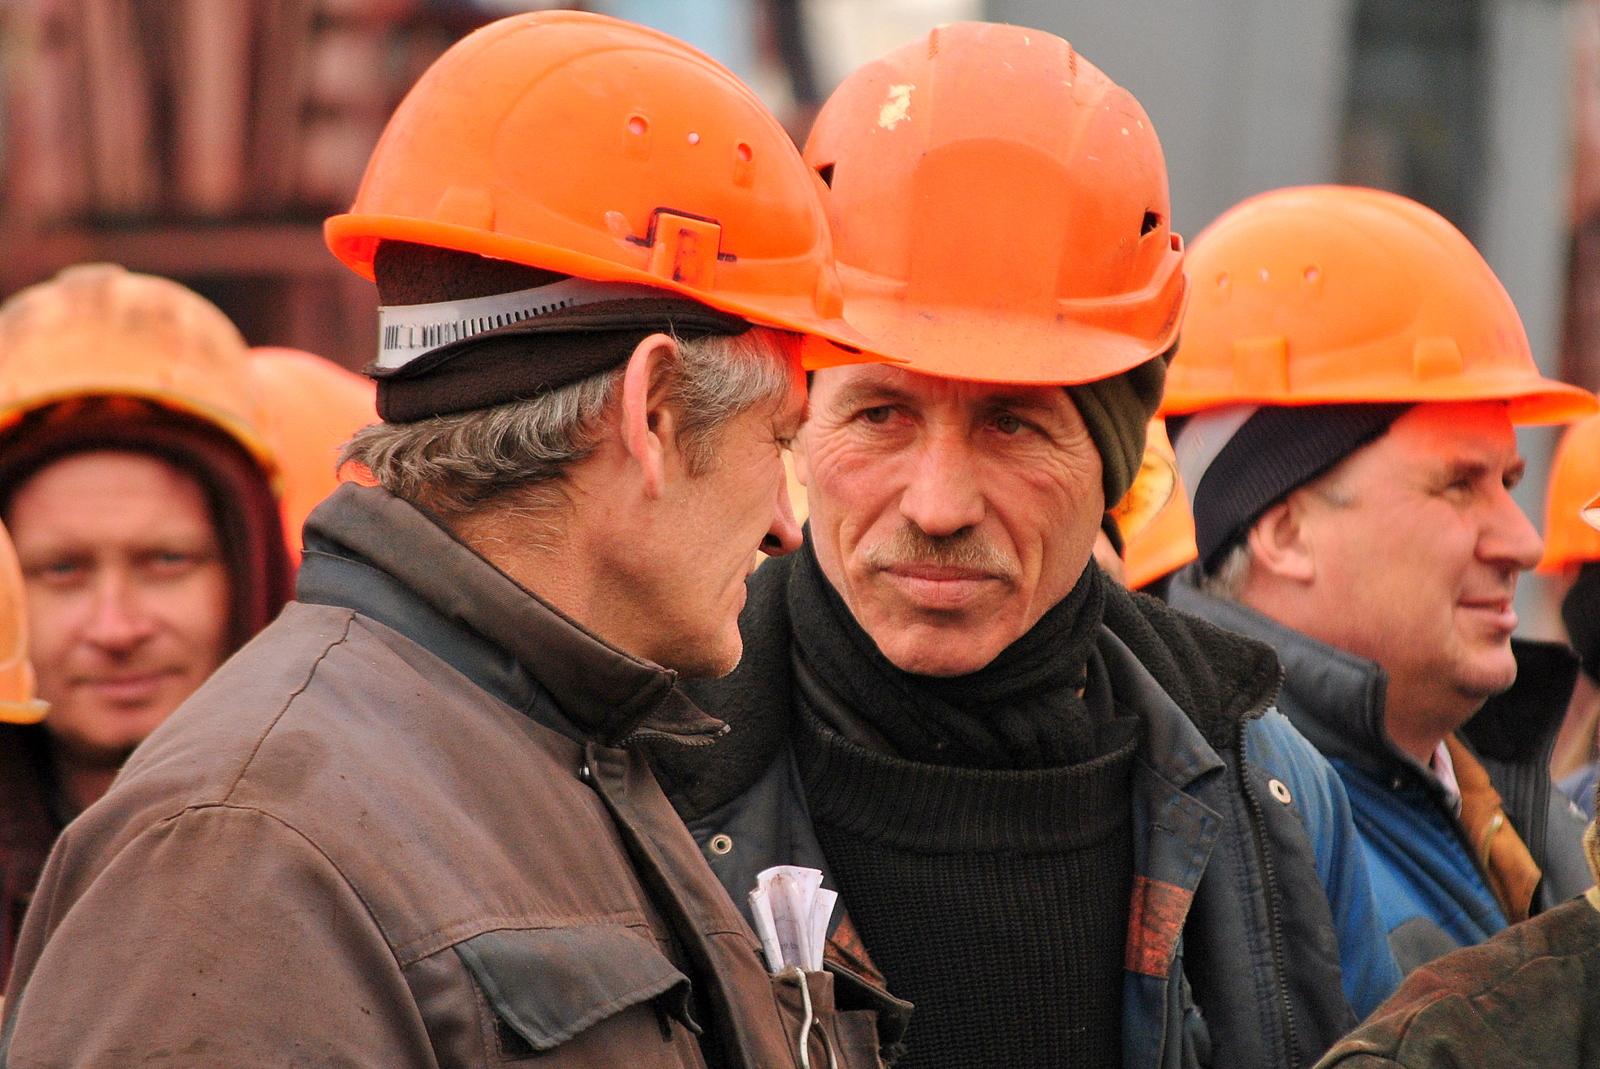 Несамоходное судно пр. В2000 завода Нибулон